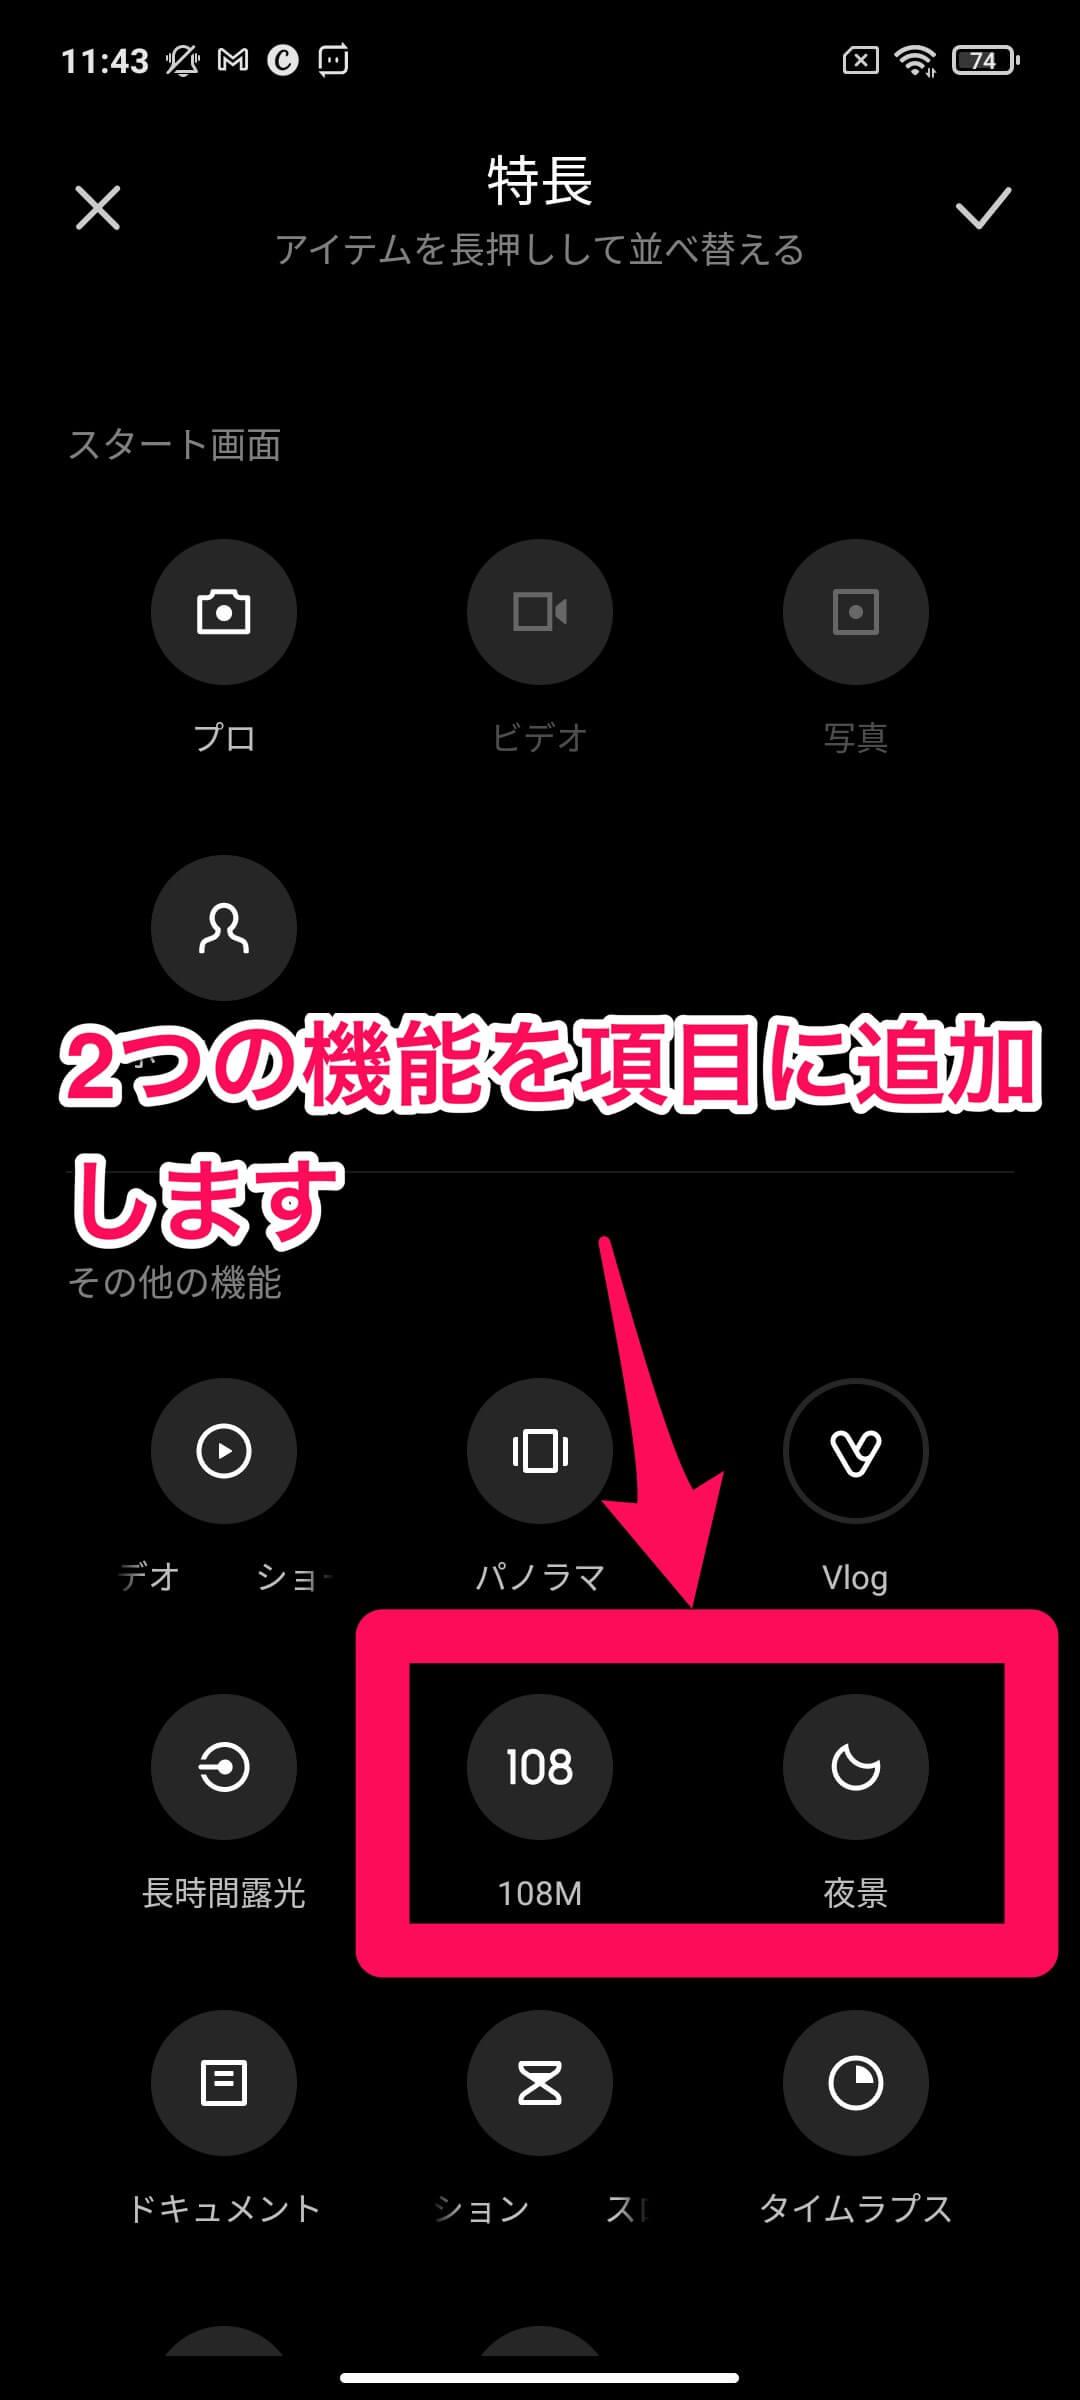 redmi note 10 proカメラアプリ画面